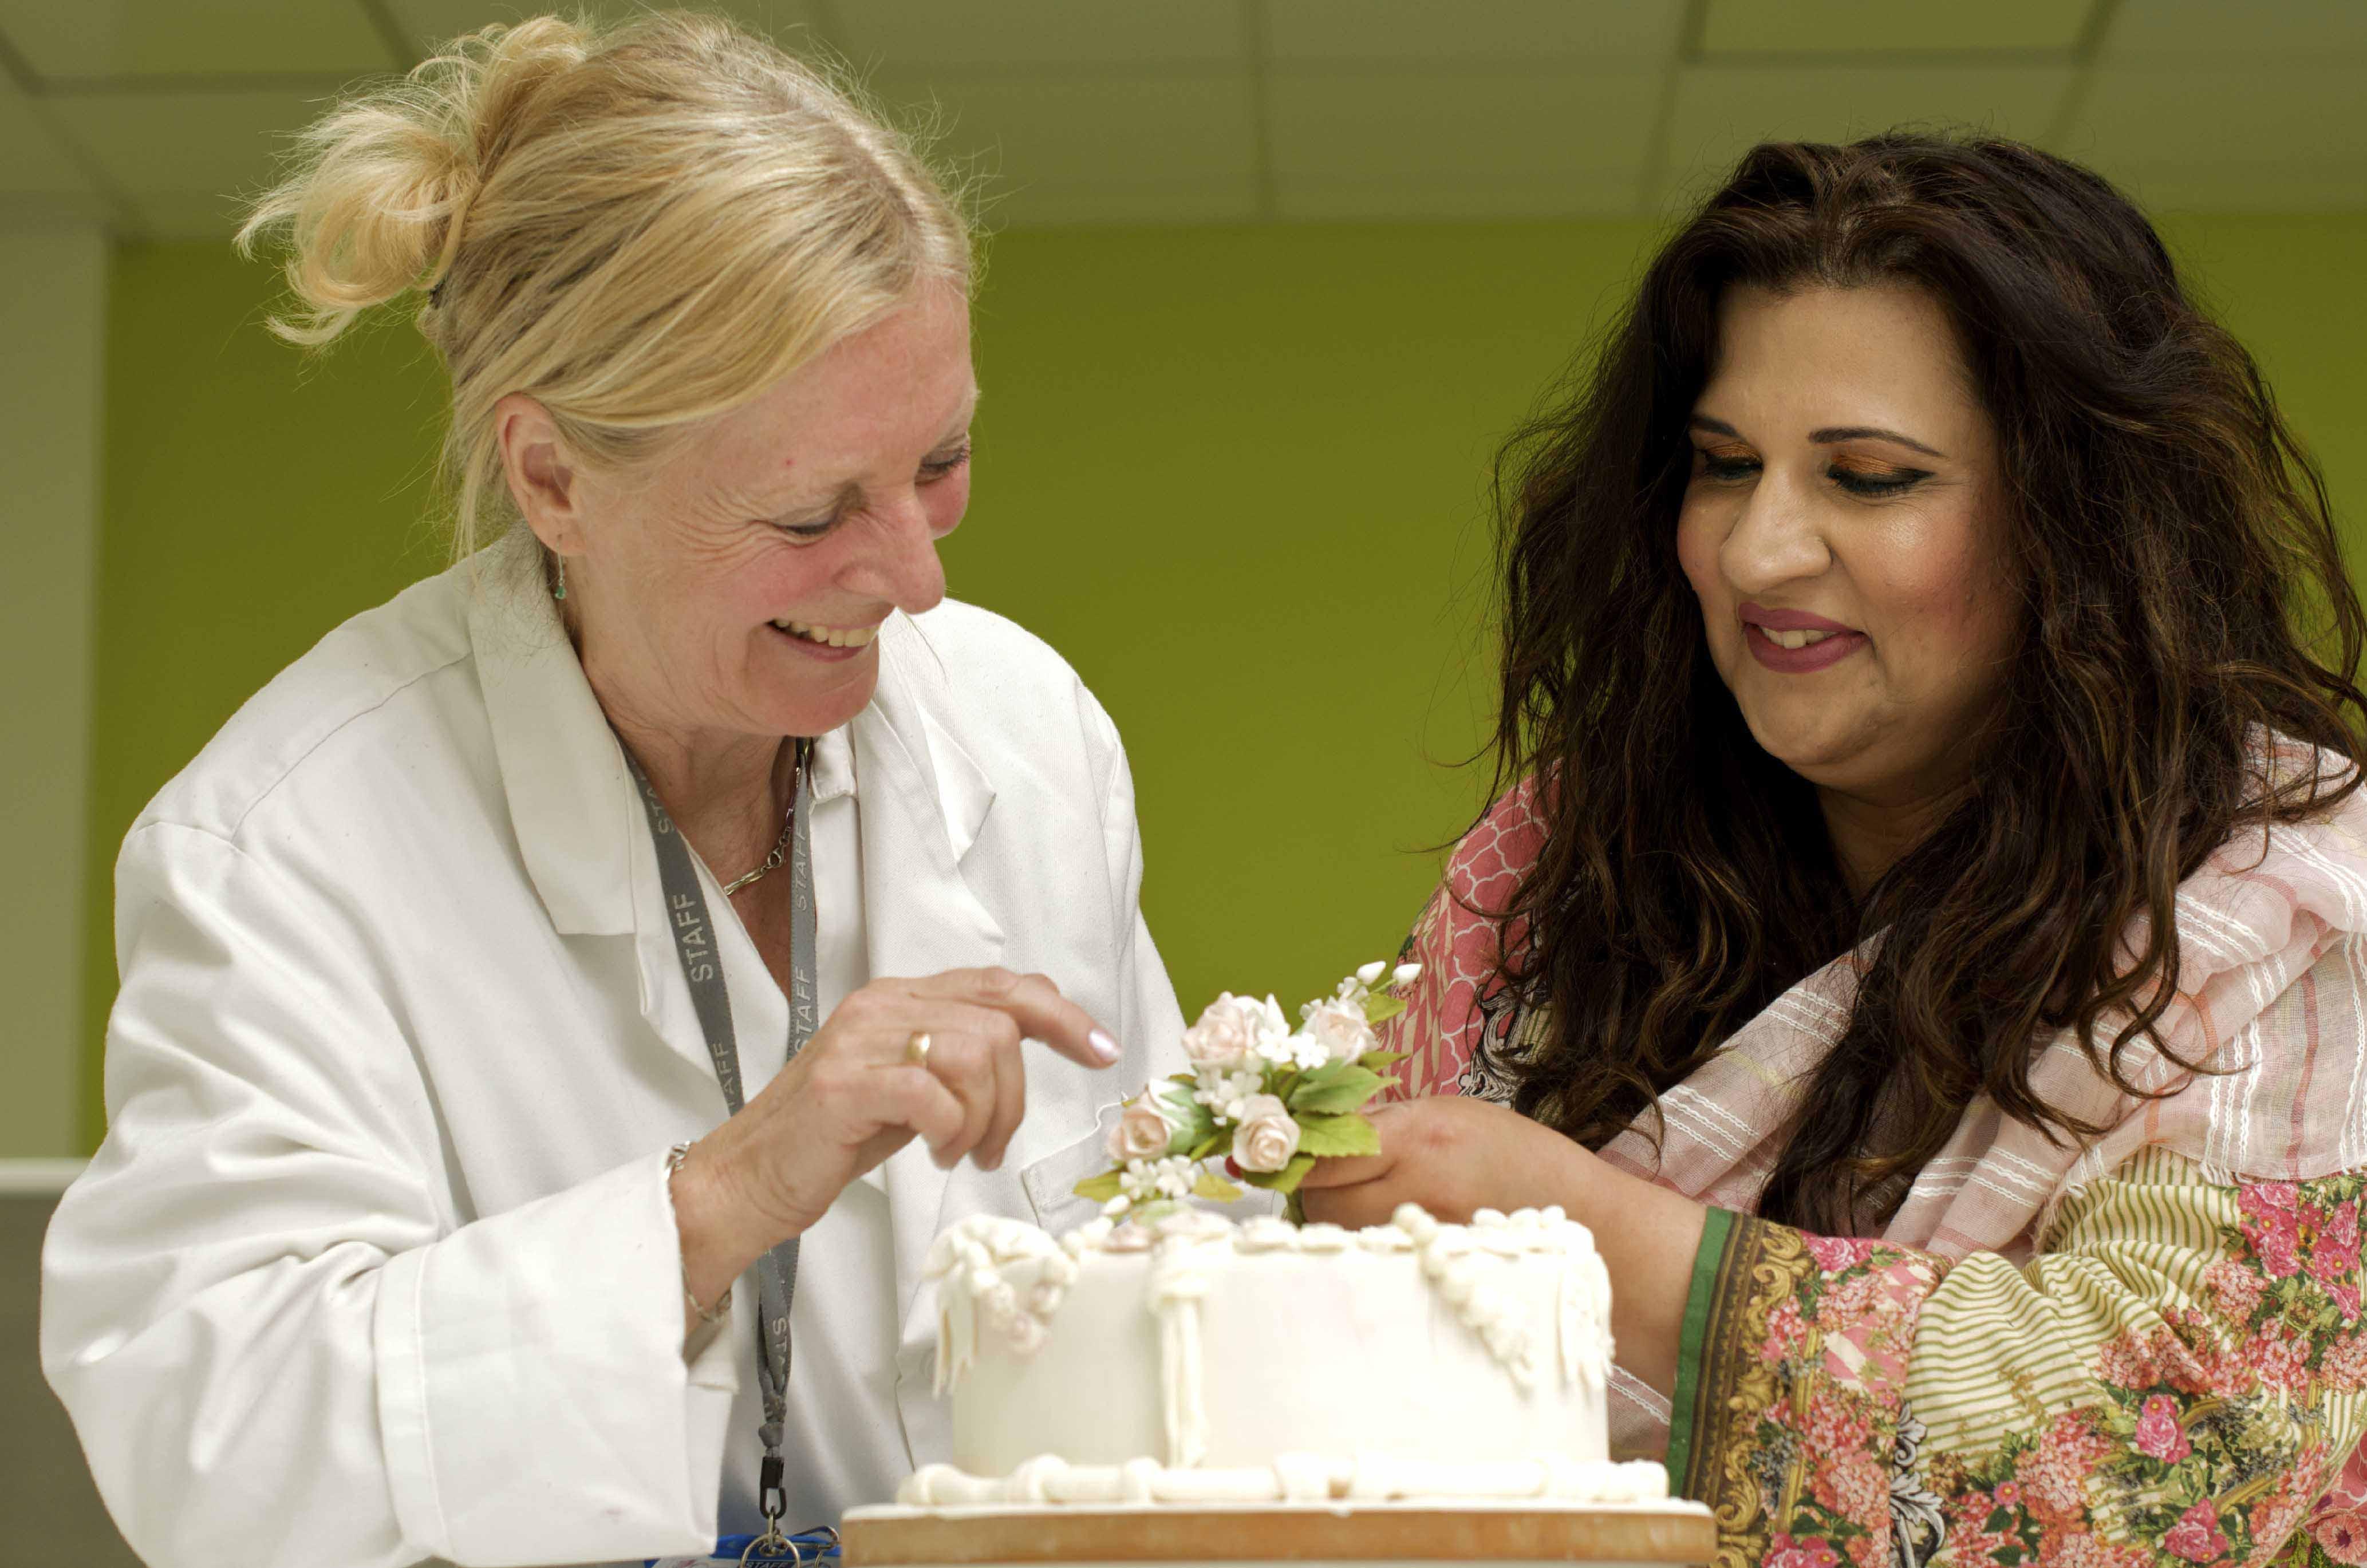 Cake Decorating Courses West Yorkshire